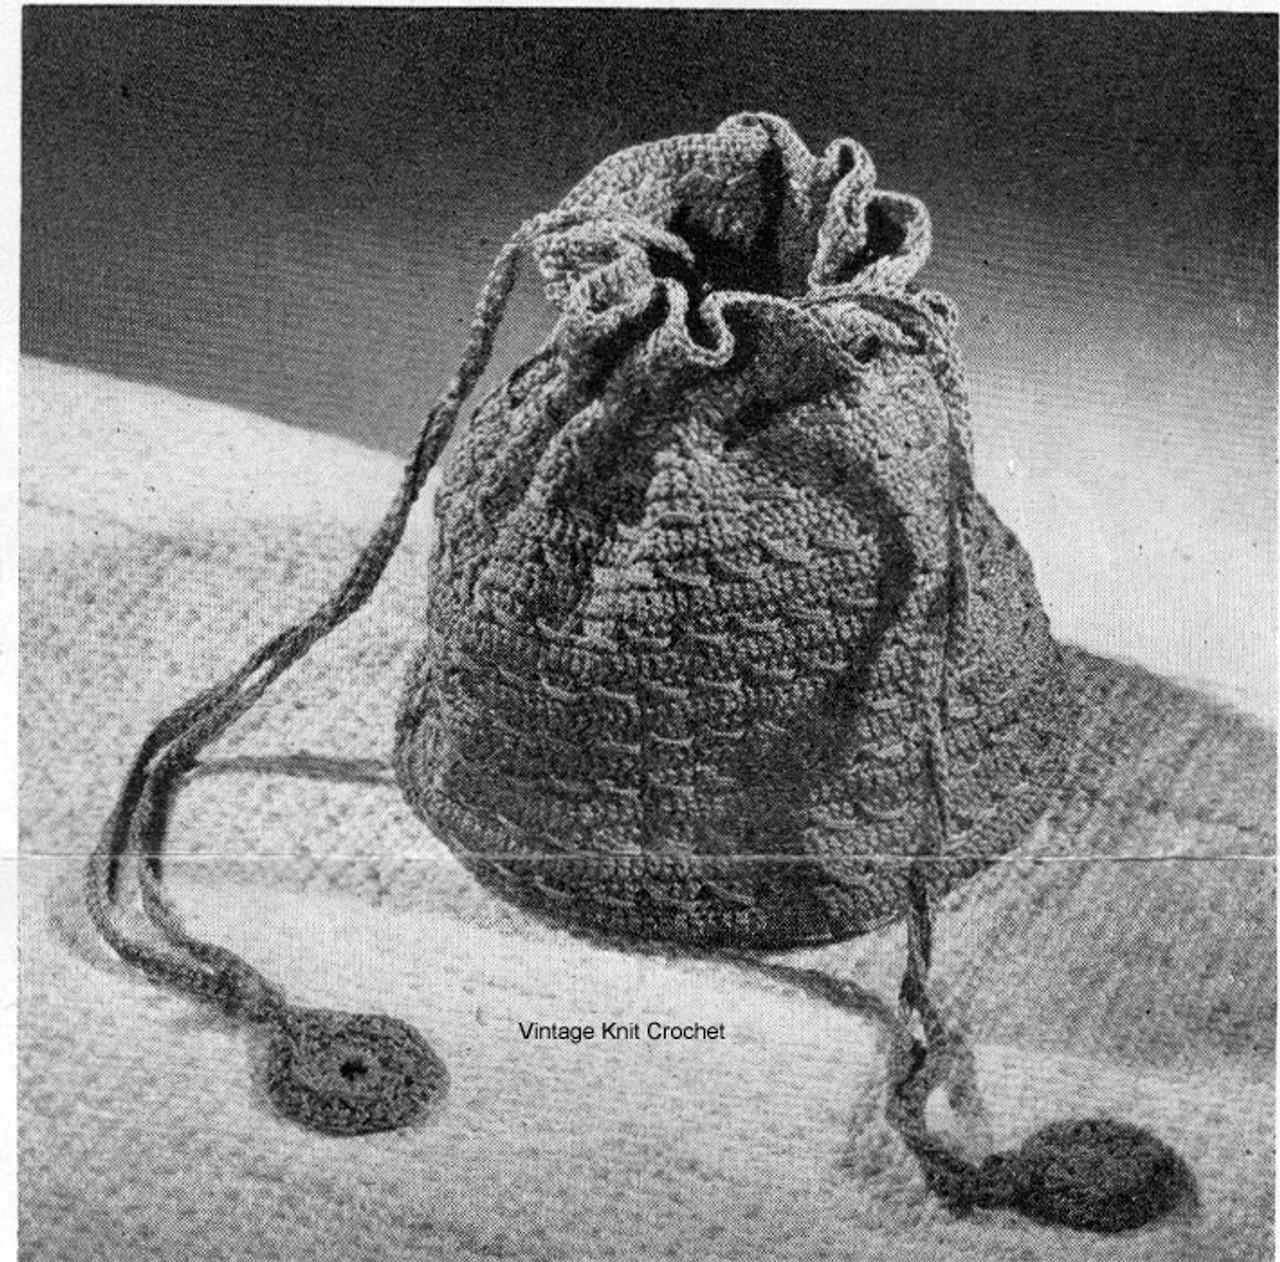 Easy Crochet Drawstring Bag in Nylon Thread